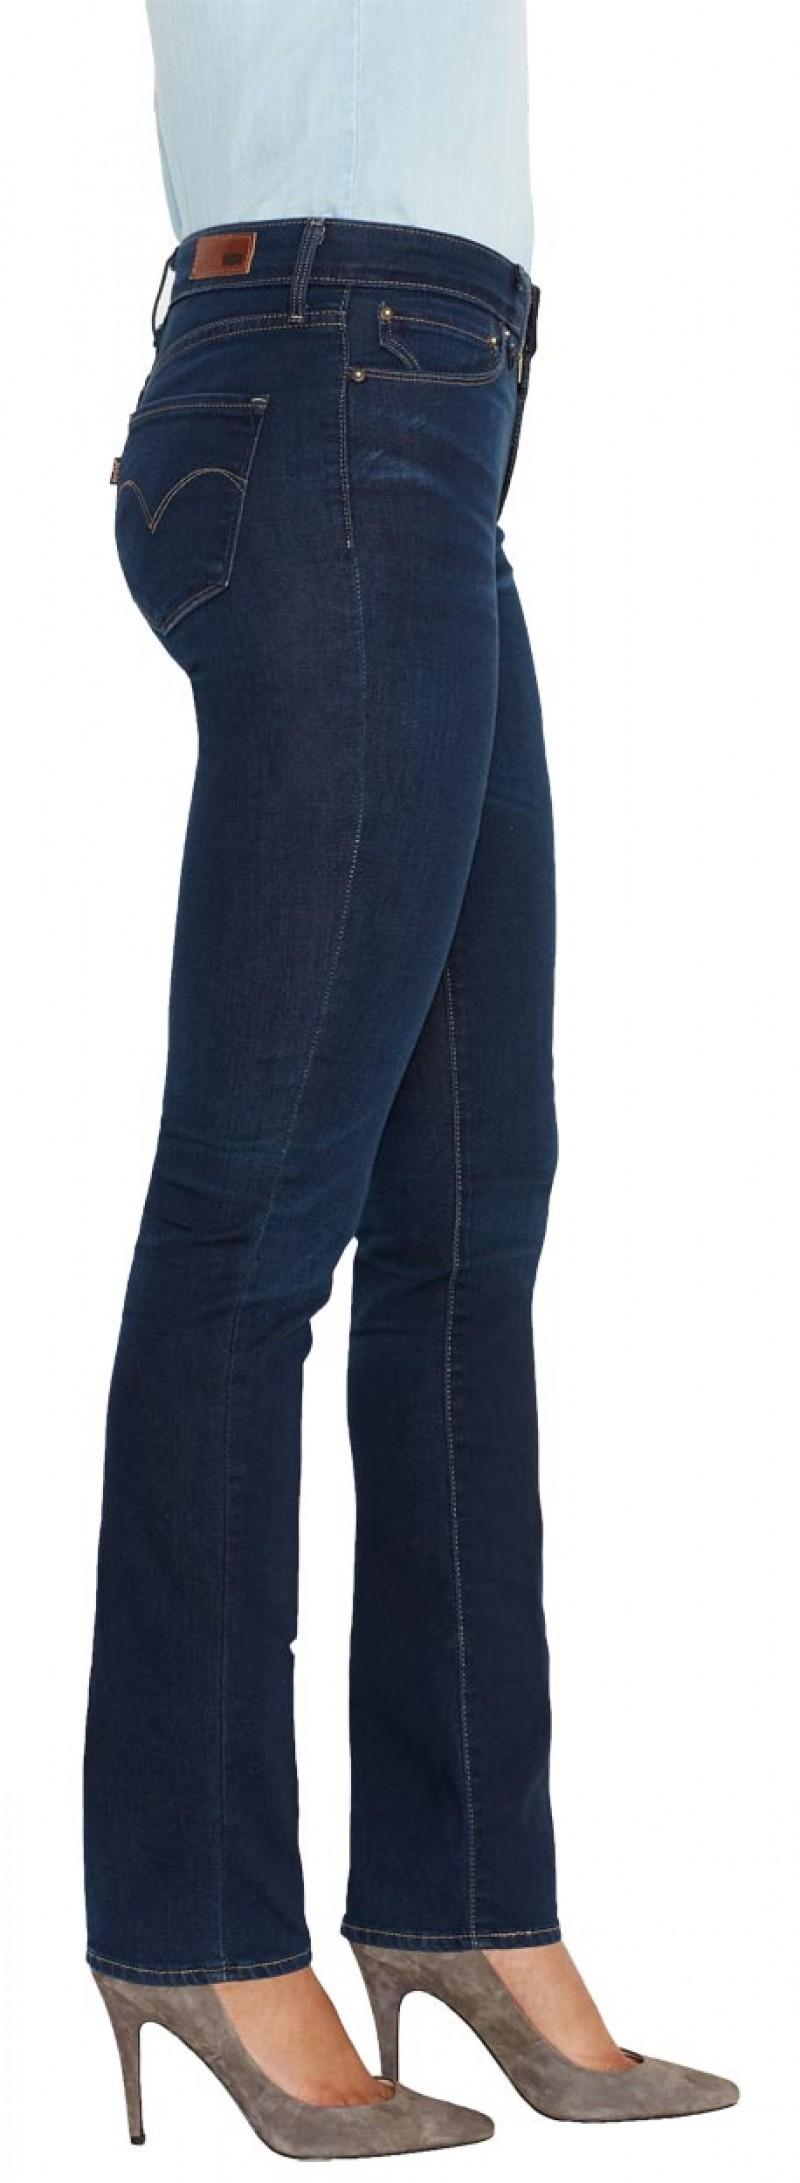 Levis Demi Curve Jeans - Slim Leg - Overcast v